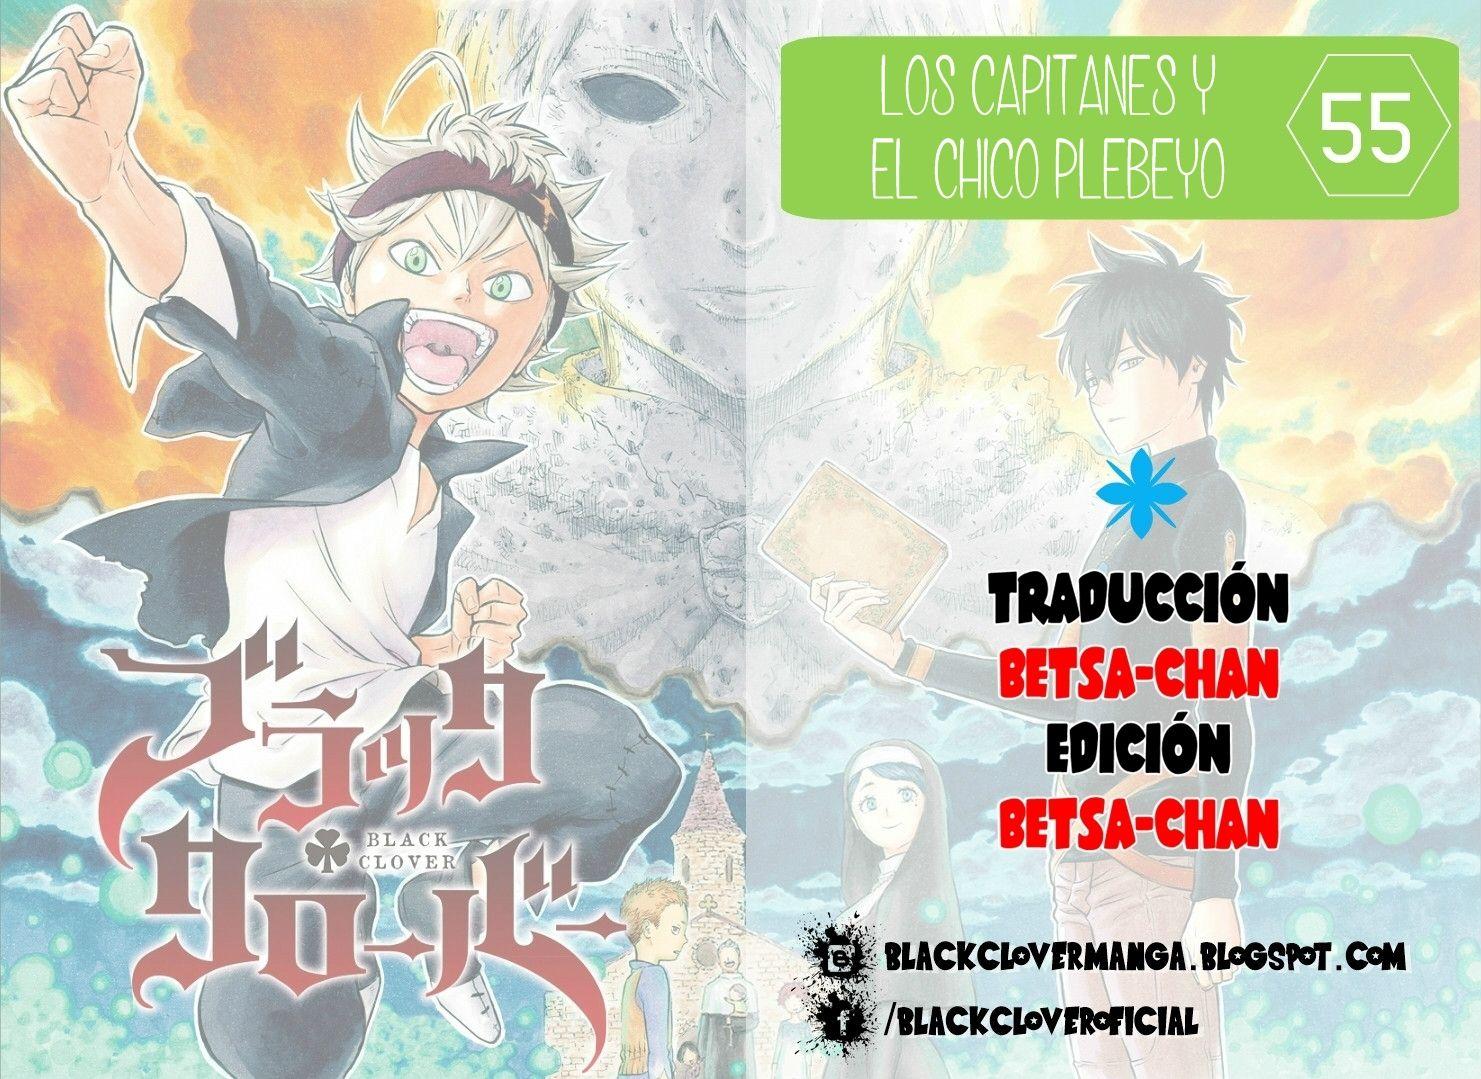 http://c5.ninemanga.com/es_manga/35/3811/459536/a50493178b14da2f6a1e45a3cea3b899.jpg Page 1